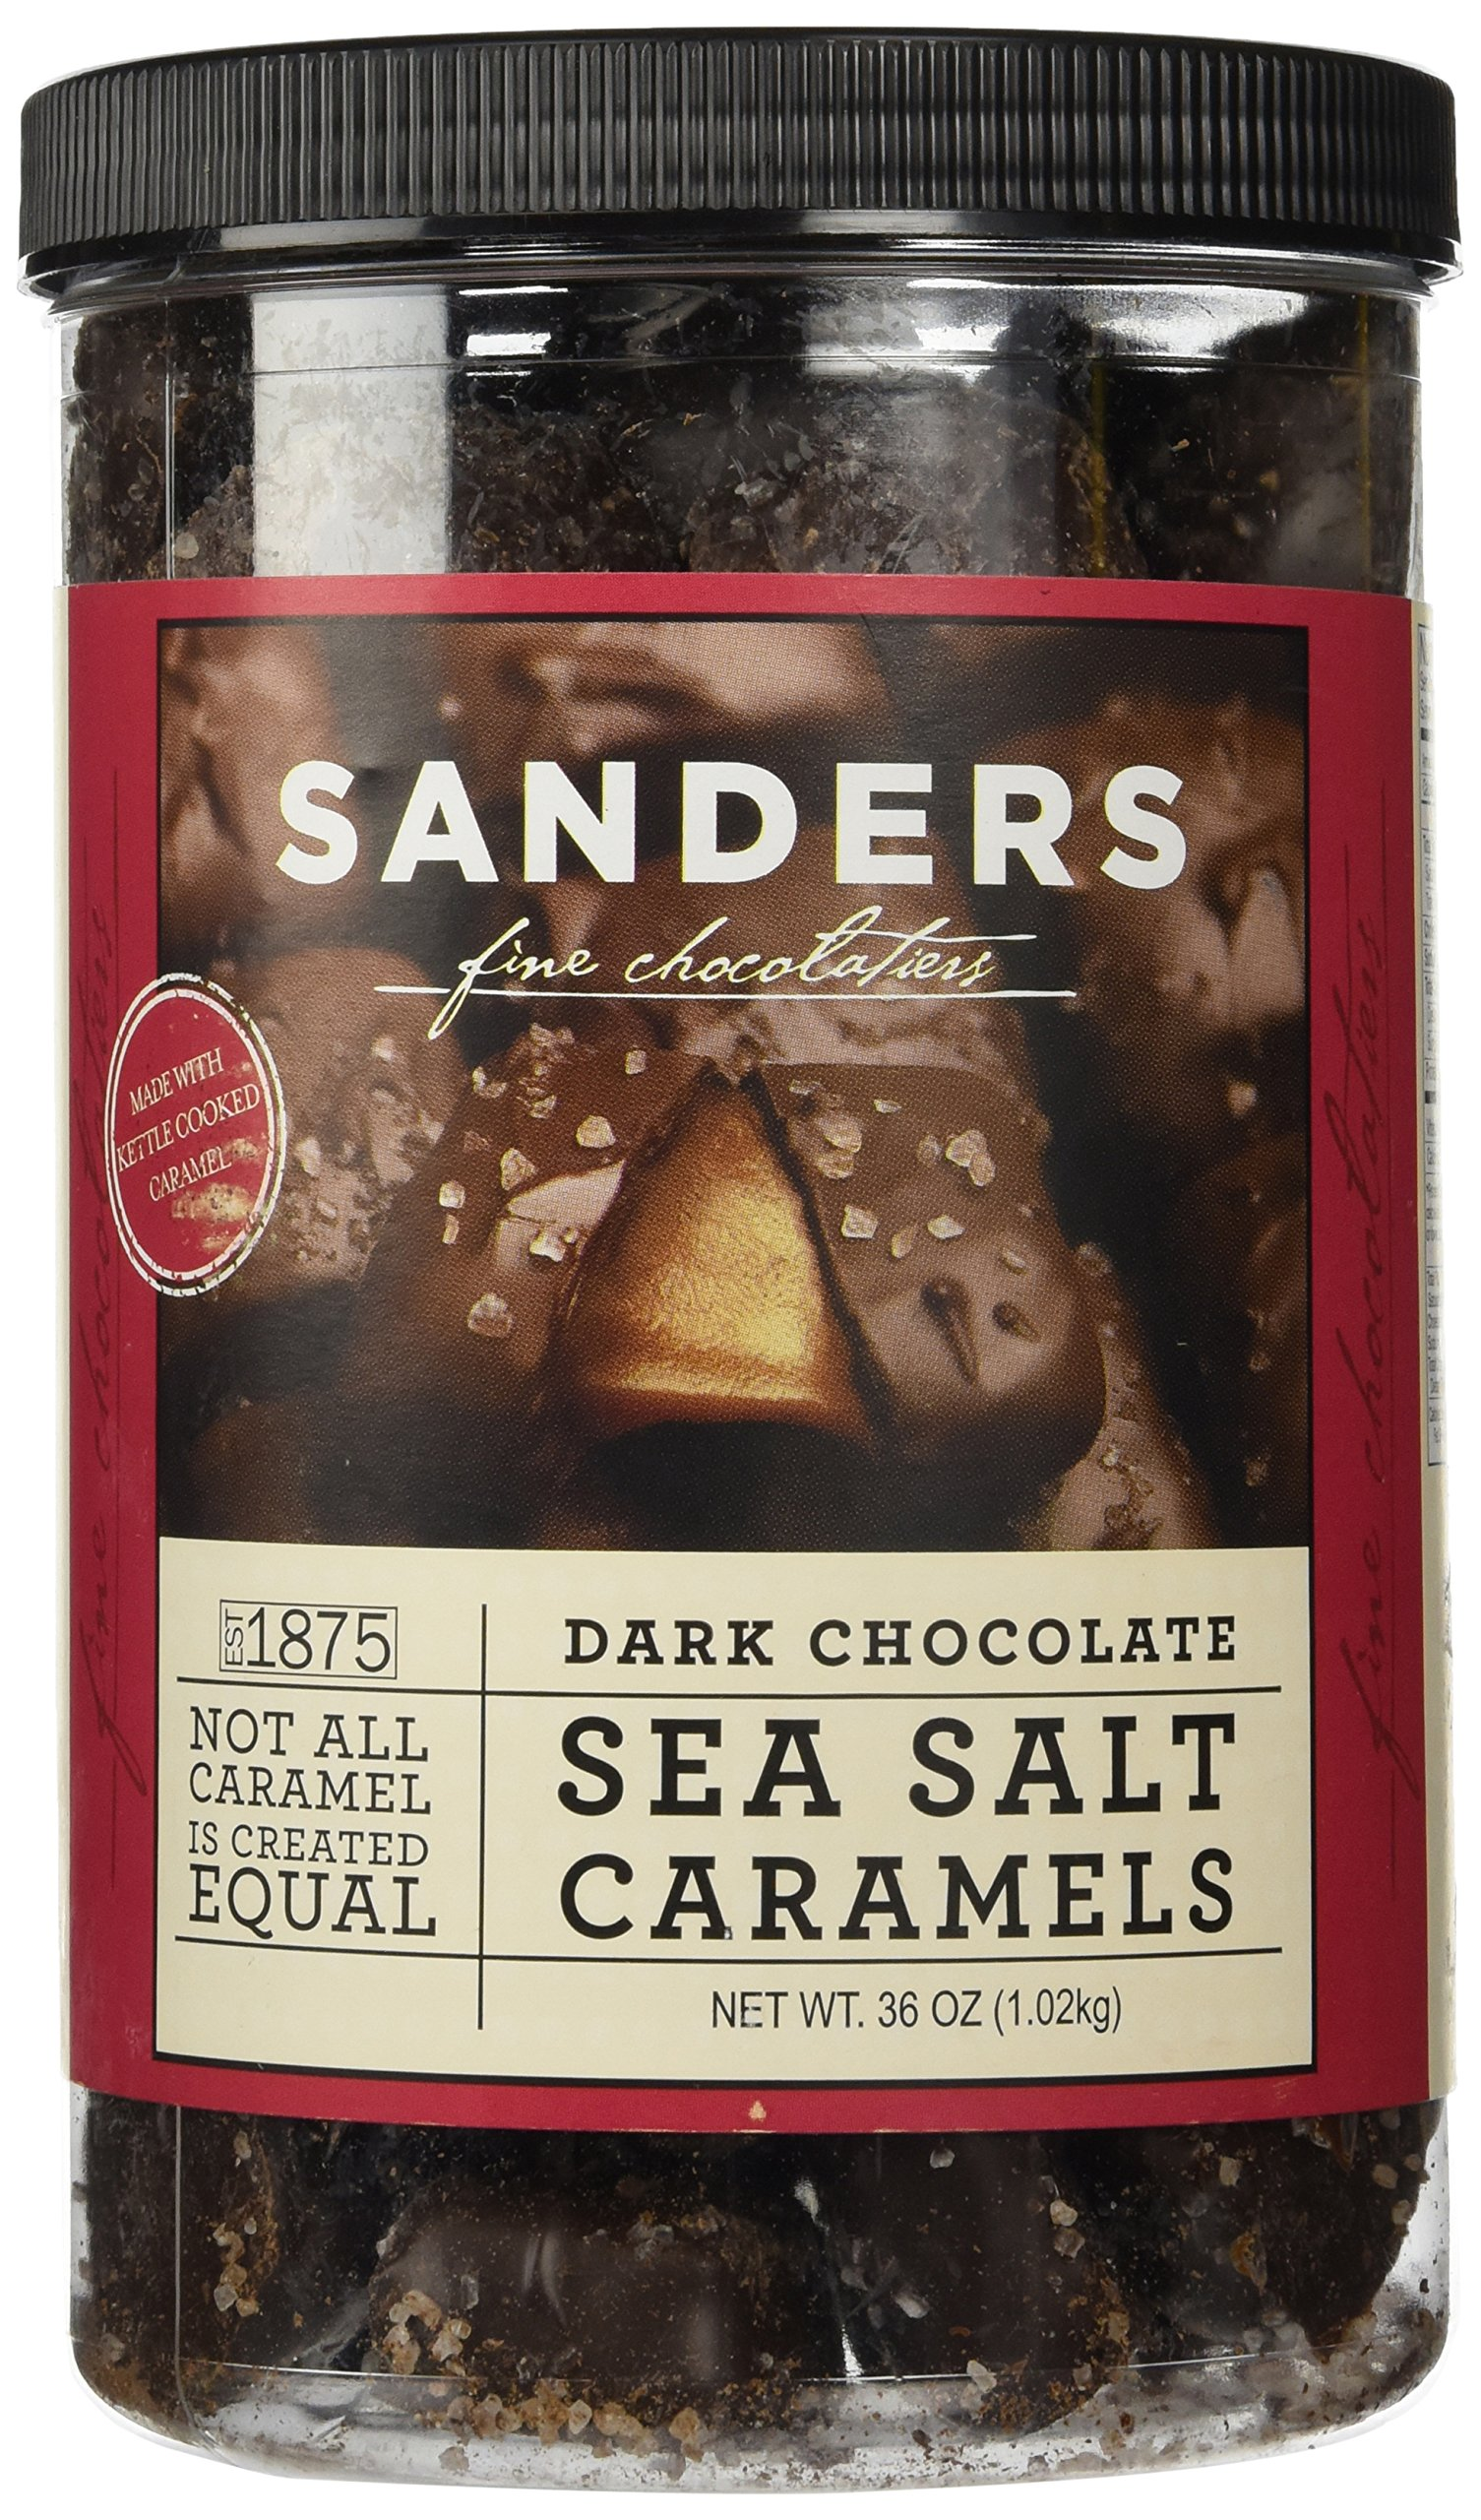 Sanders Dark Chocolate Sea Salt Caramels - 36 ounces (2.25 pounds) by Sanders®